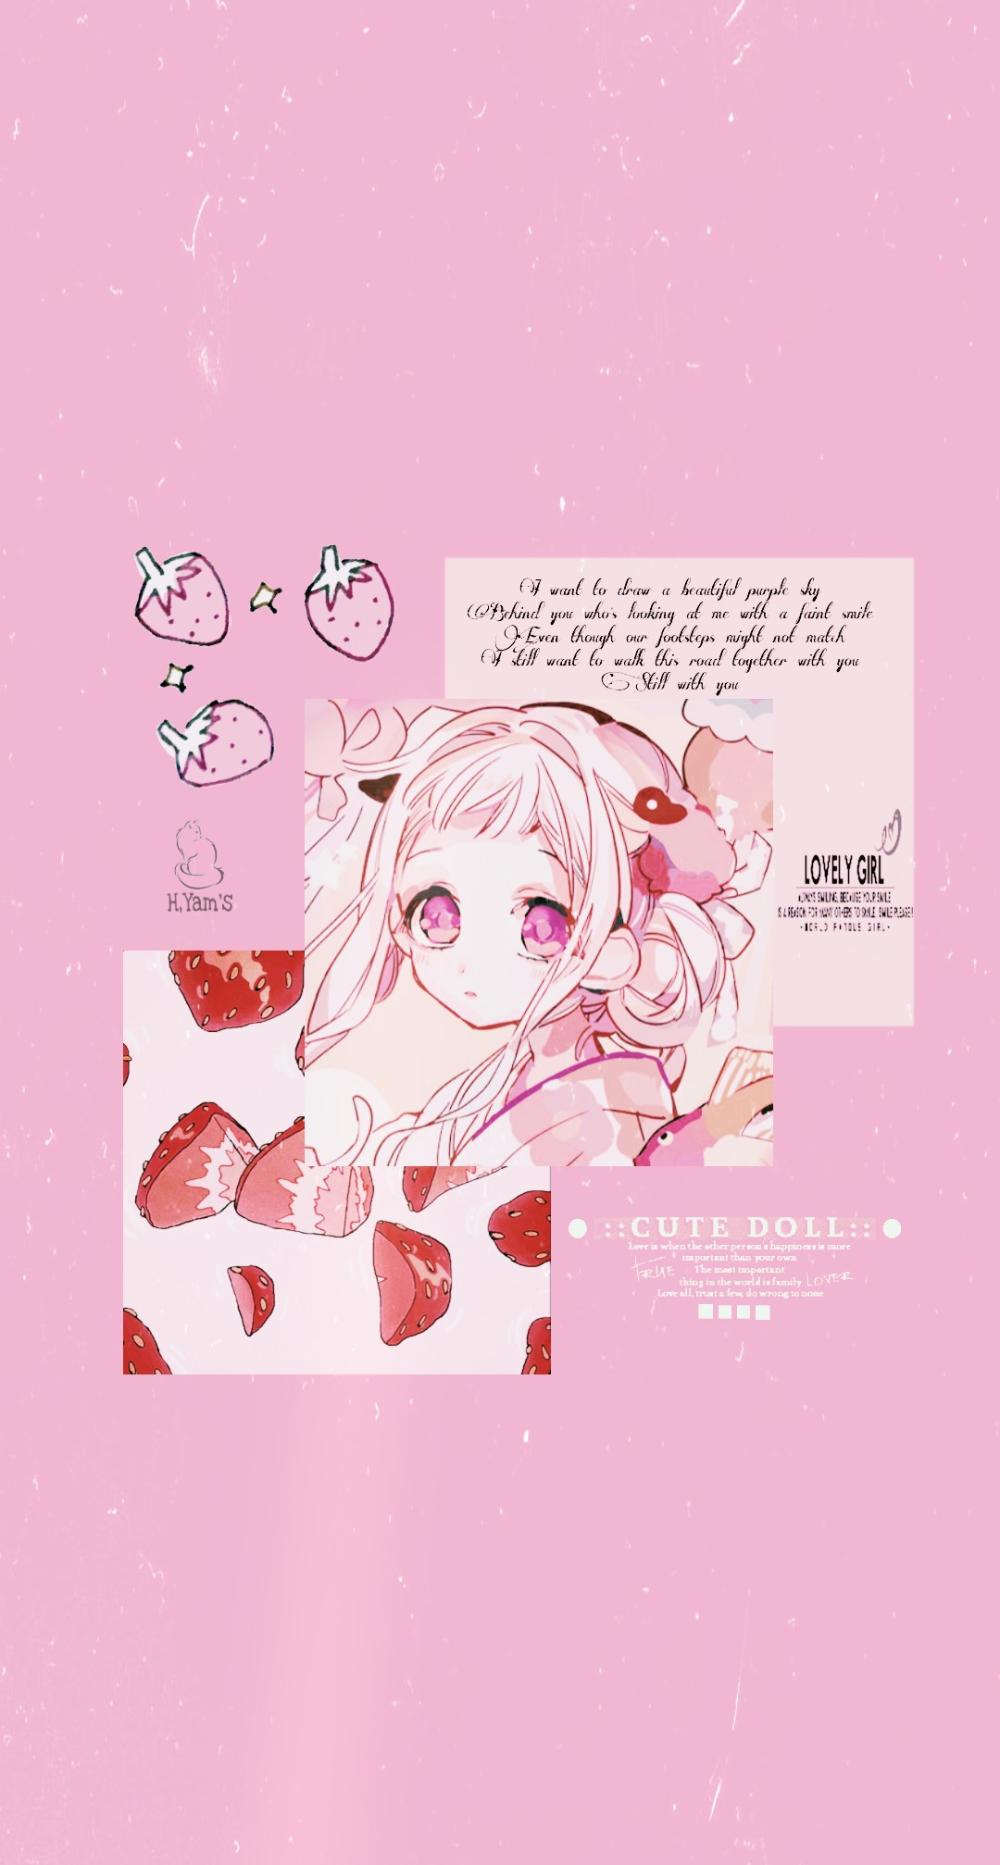 Liwliet On Twitter Pink Wallpaper Anime Cute Anime Wallpaper Anime Wallpaper